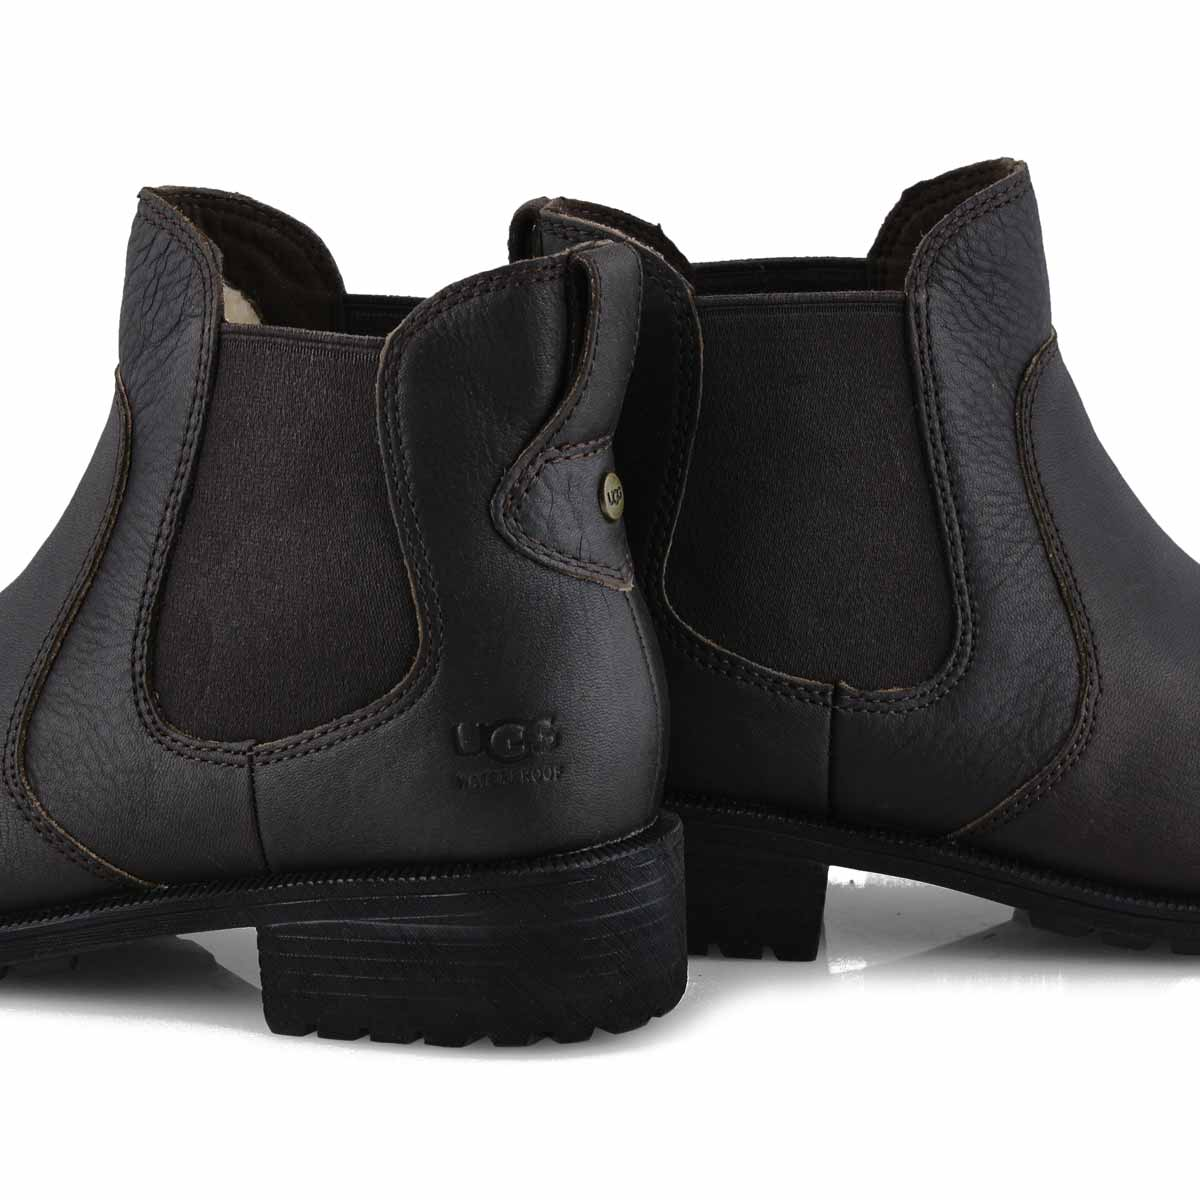 Women's Bonham III Waterproof Chelsea Boot - Stout